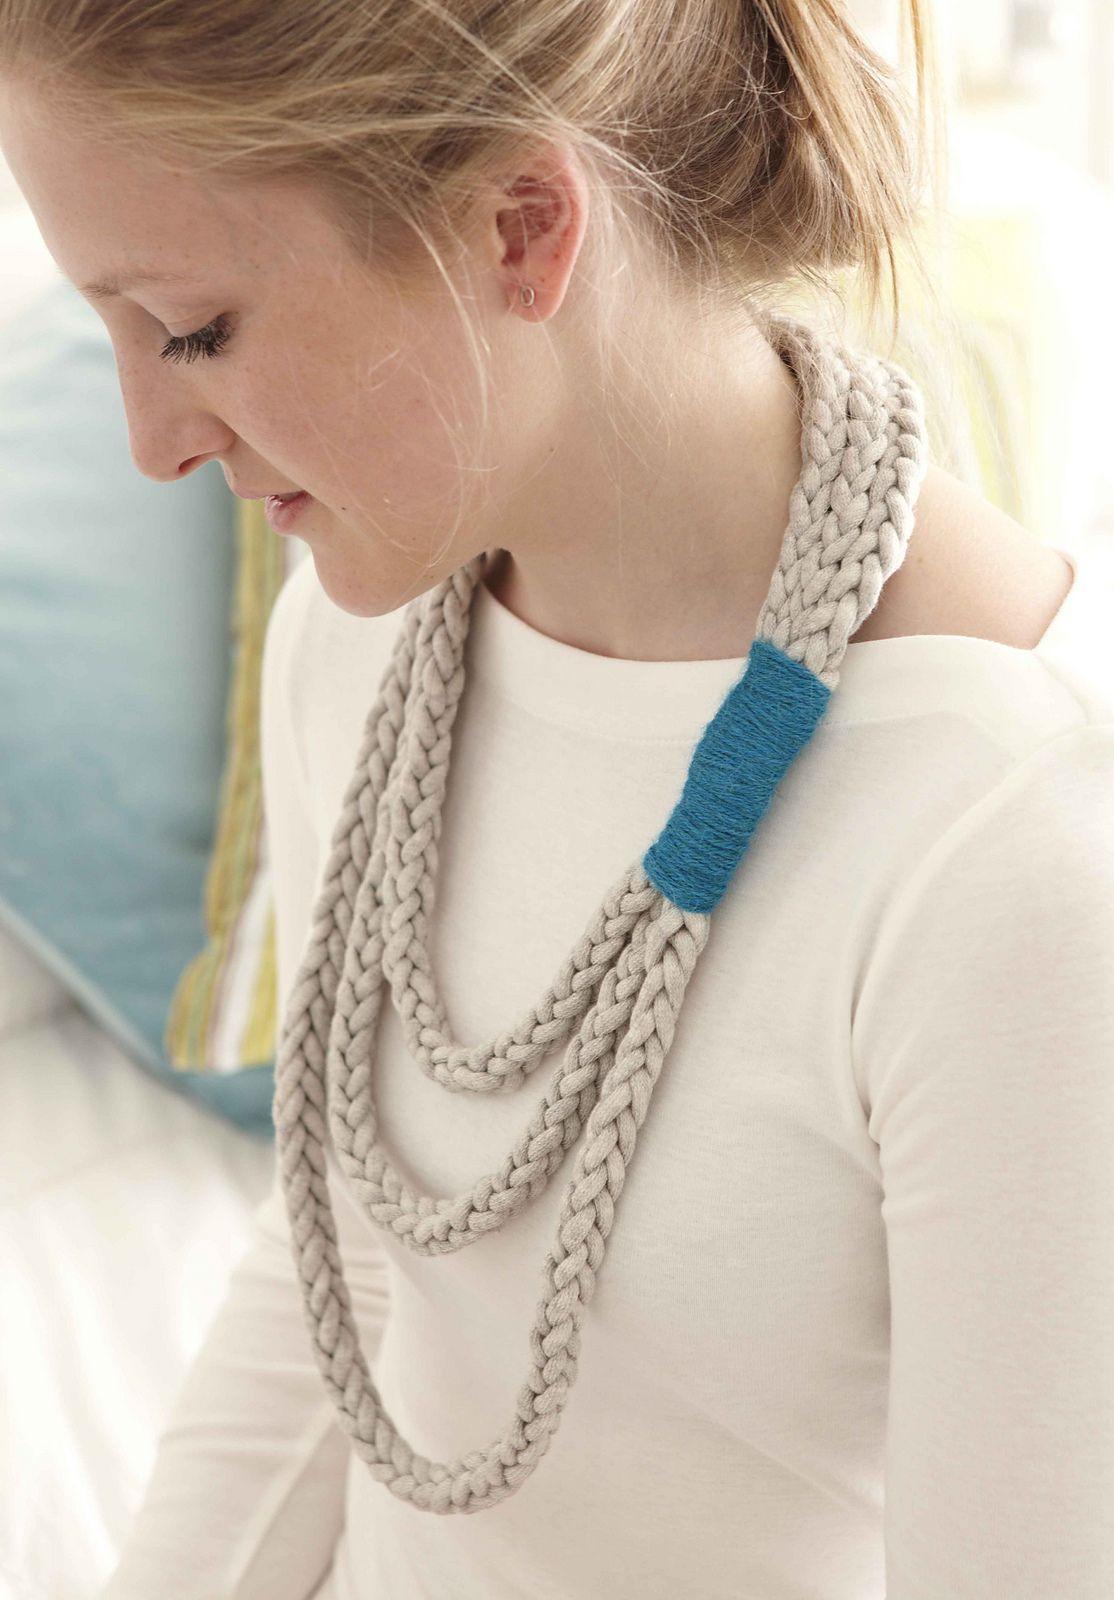 Ravelry: Layered Loop Necklace by Laura Strutt | Πλεκτά κασκόλ ...